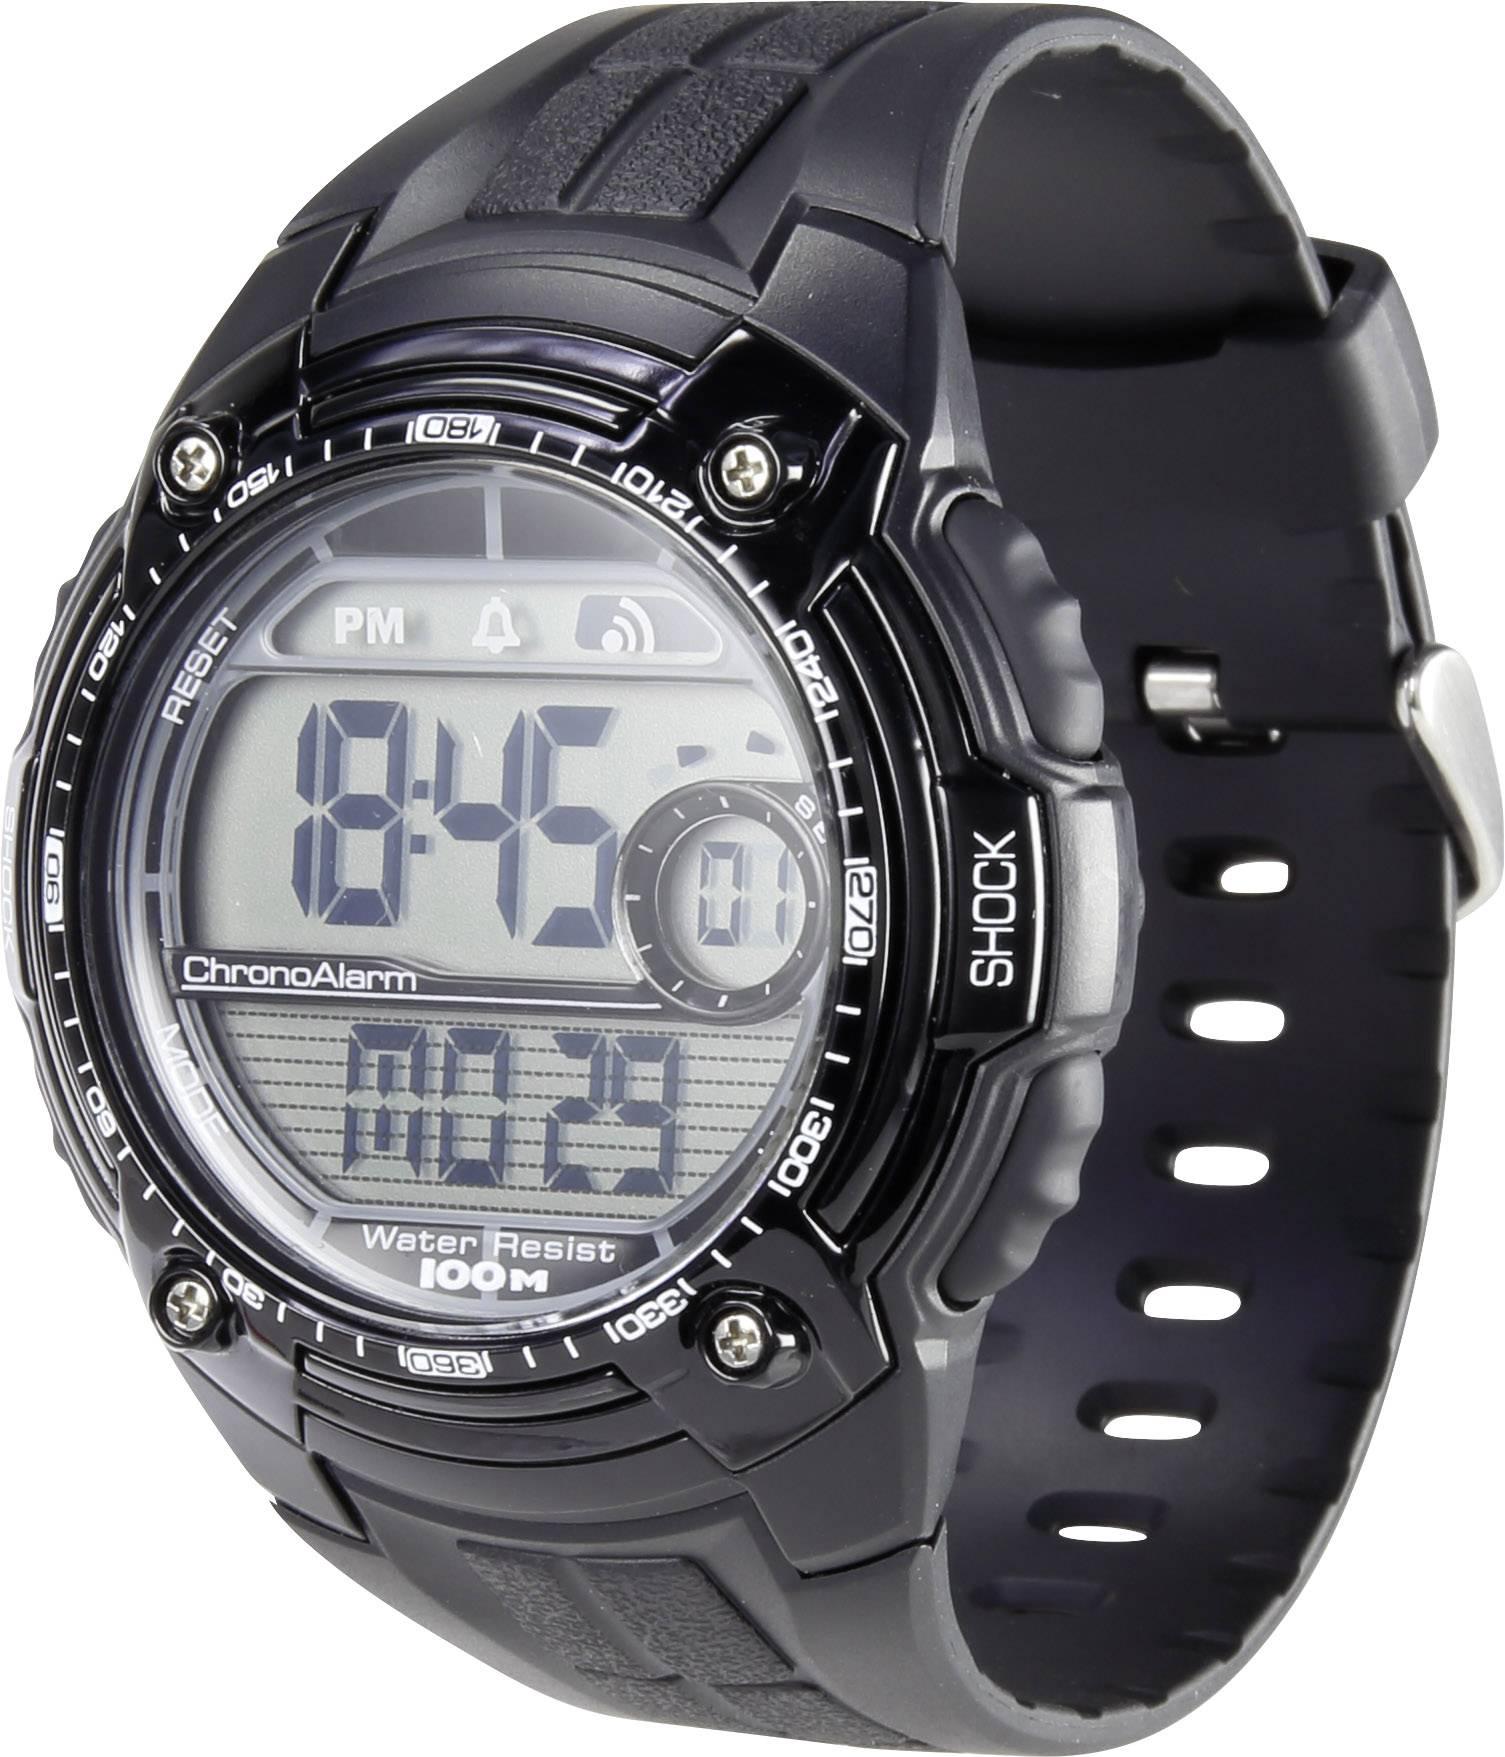 Náramkové hodinky Renkforce YP09426A, čierna